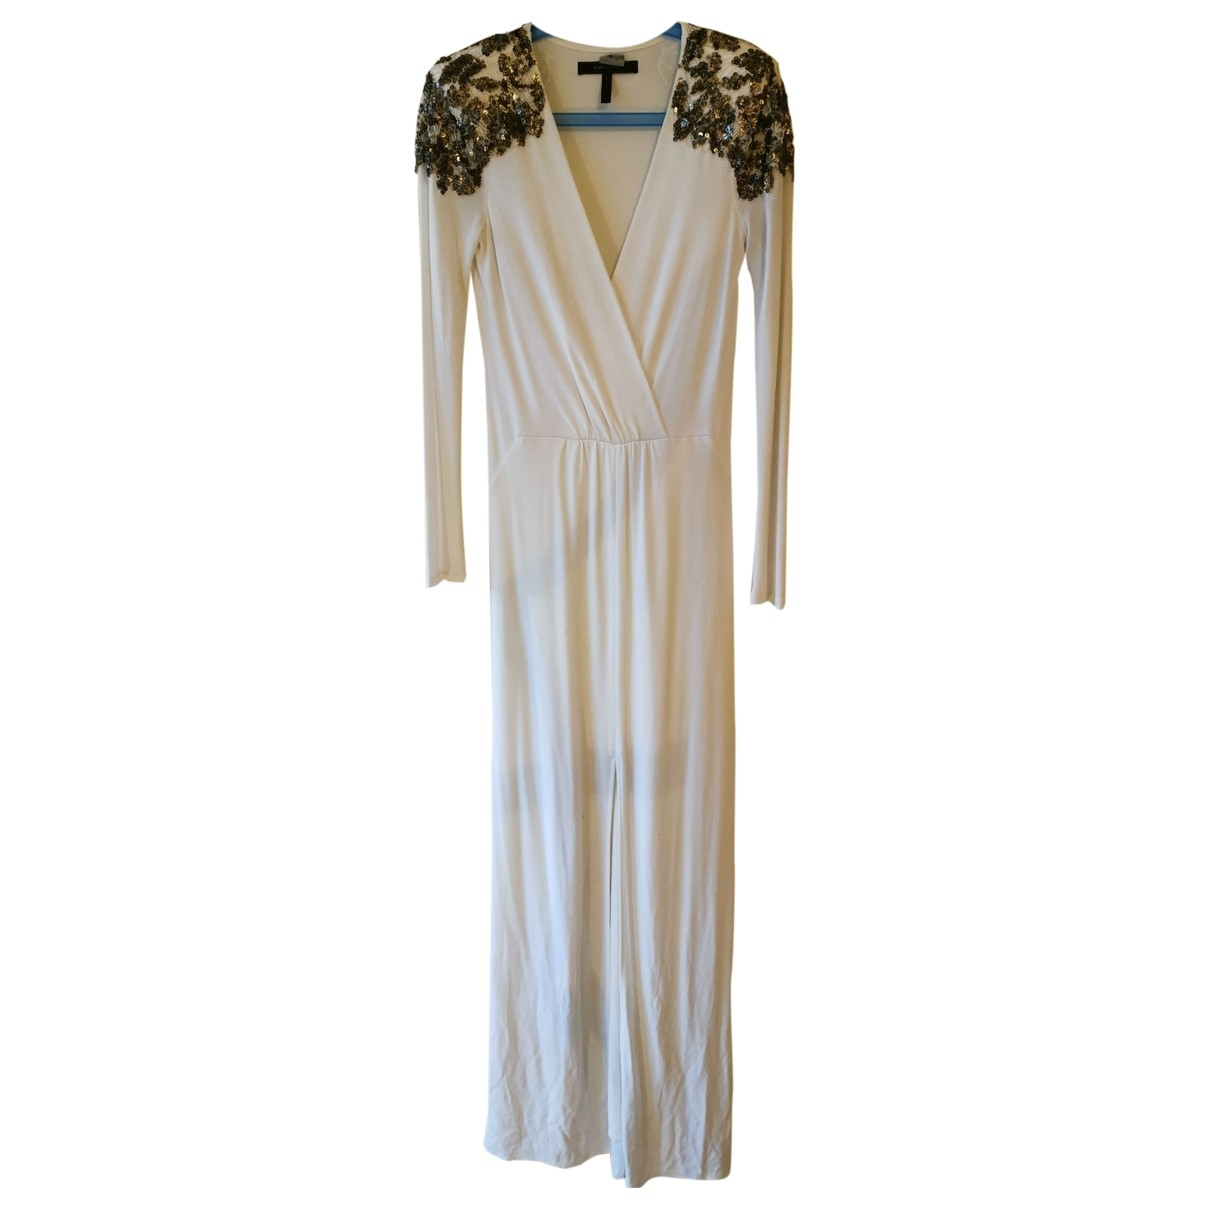 Bcbg Max Azria \N White dress for Women S International